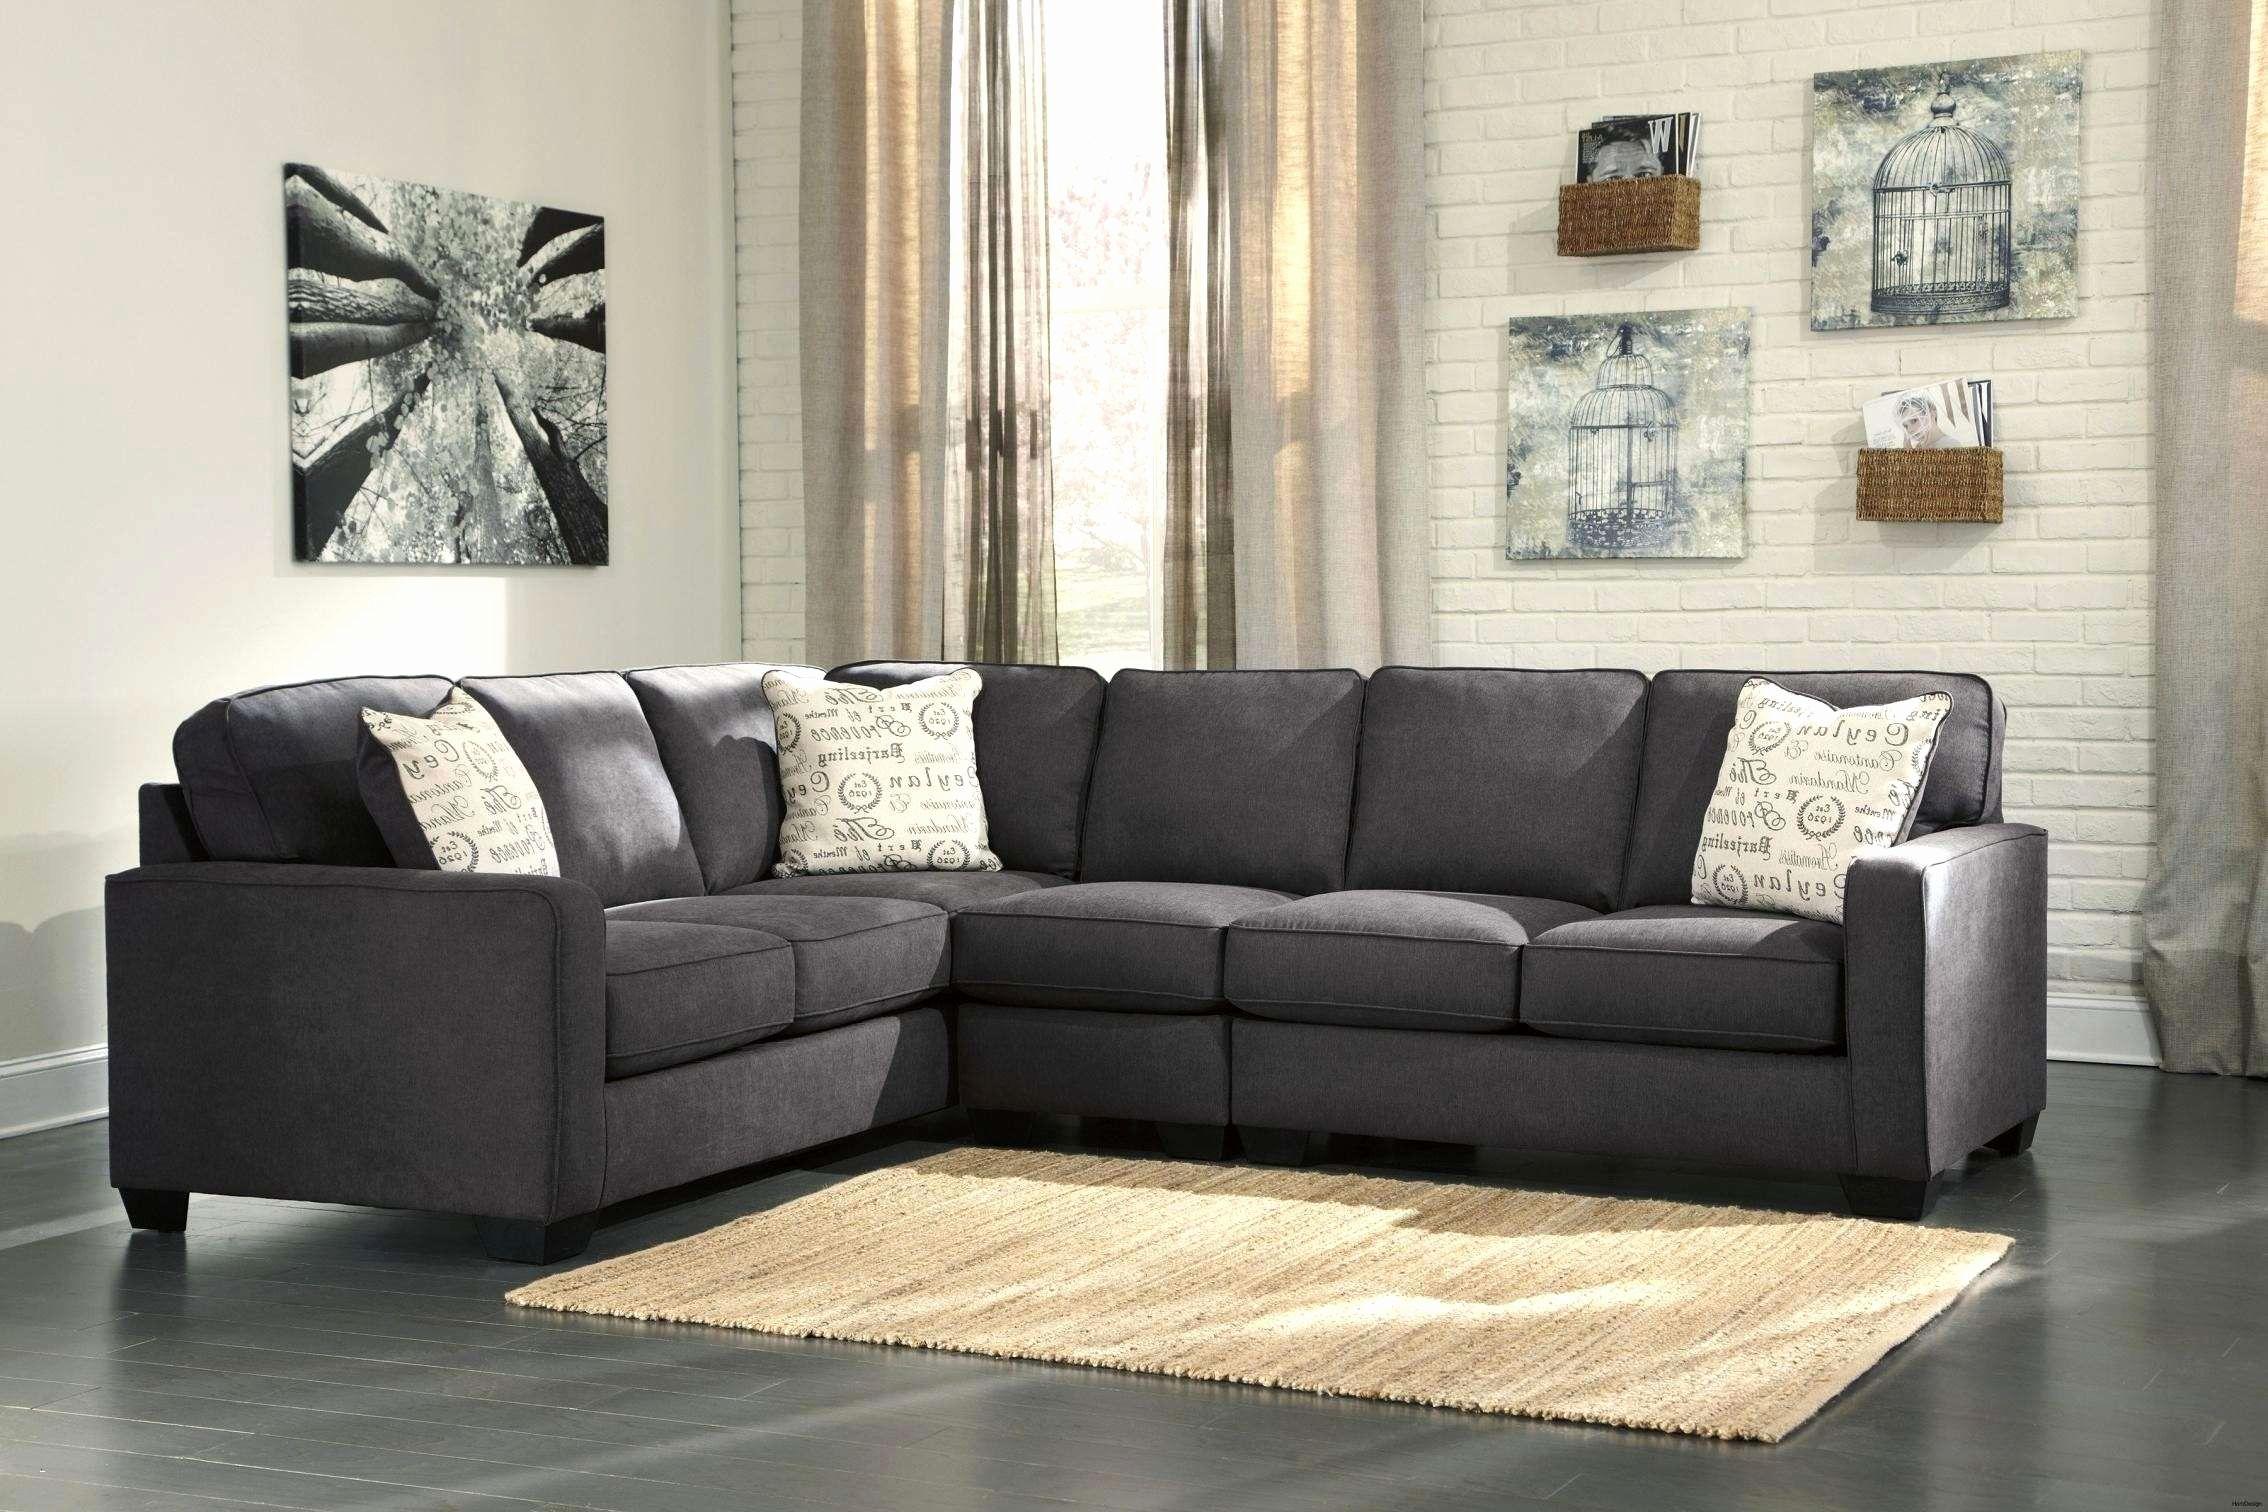 79 Attraktiv Sofa Englisch Ruang Keluarga Mewah Set Ruang Keluarga Sofa L